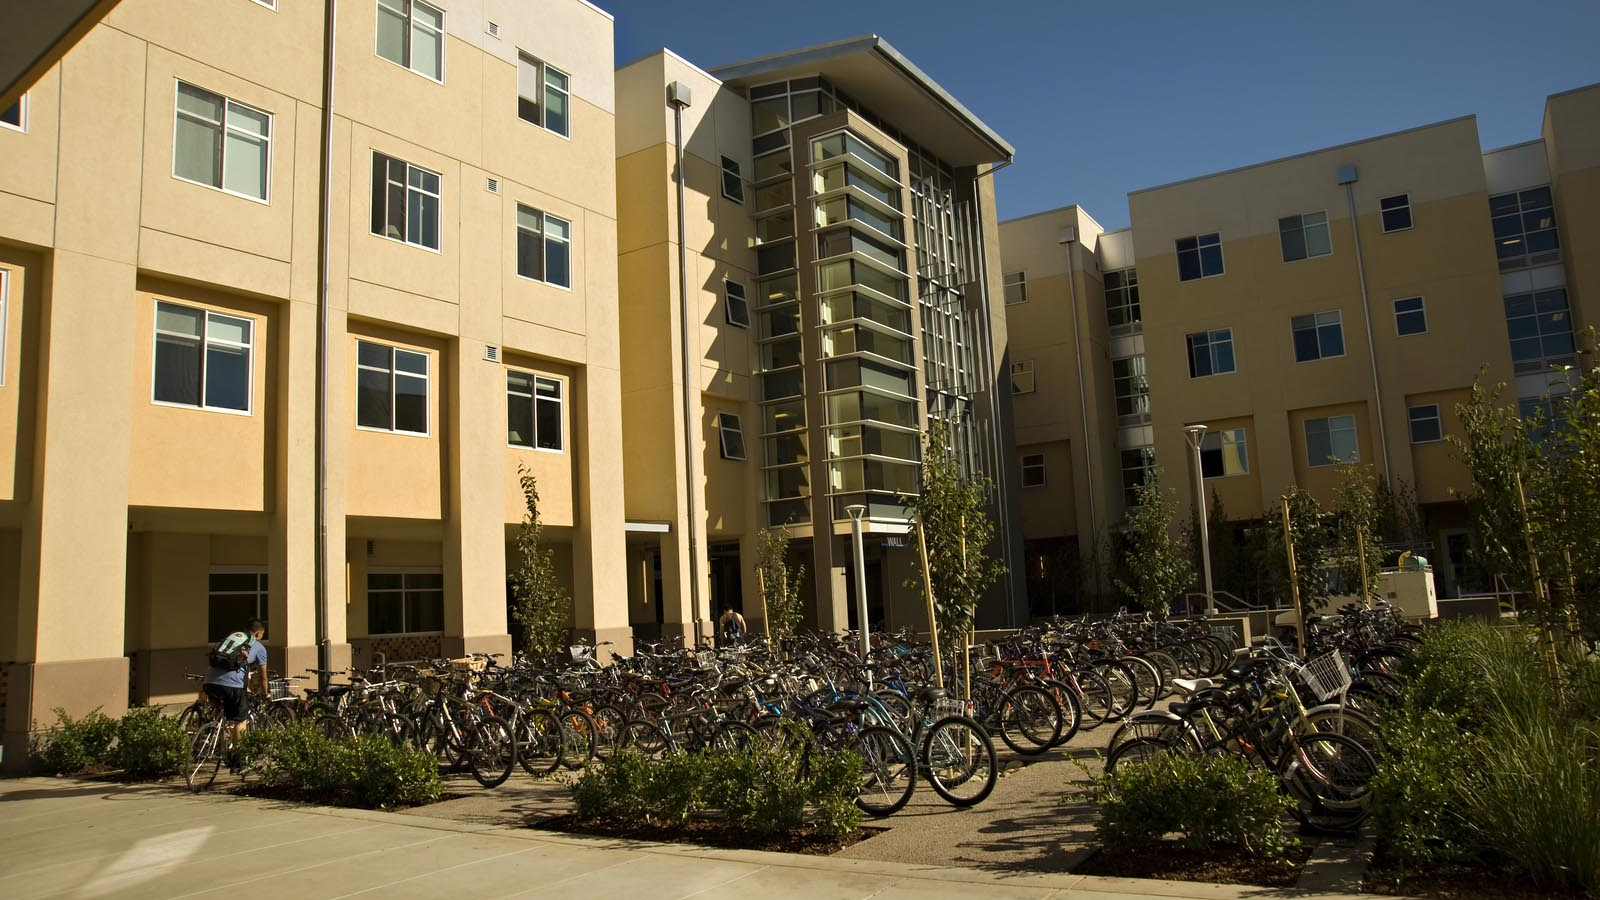 Affordable Student Housing | UC Davis Uc Davis Dorms